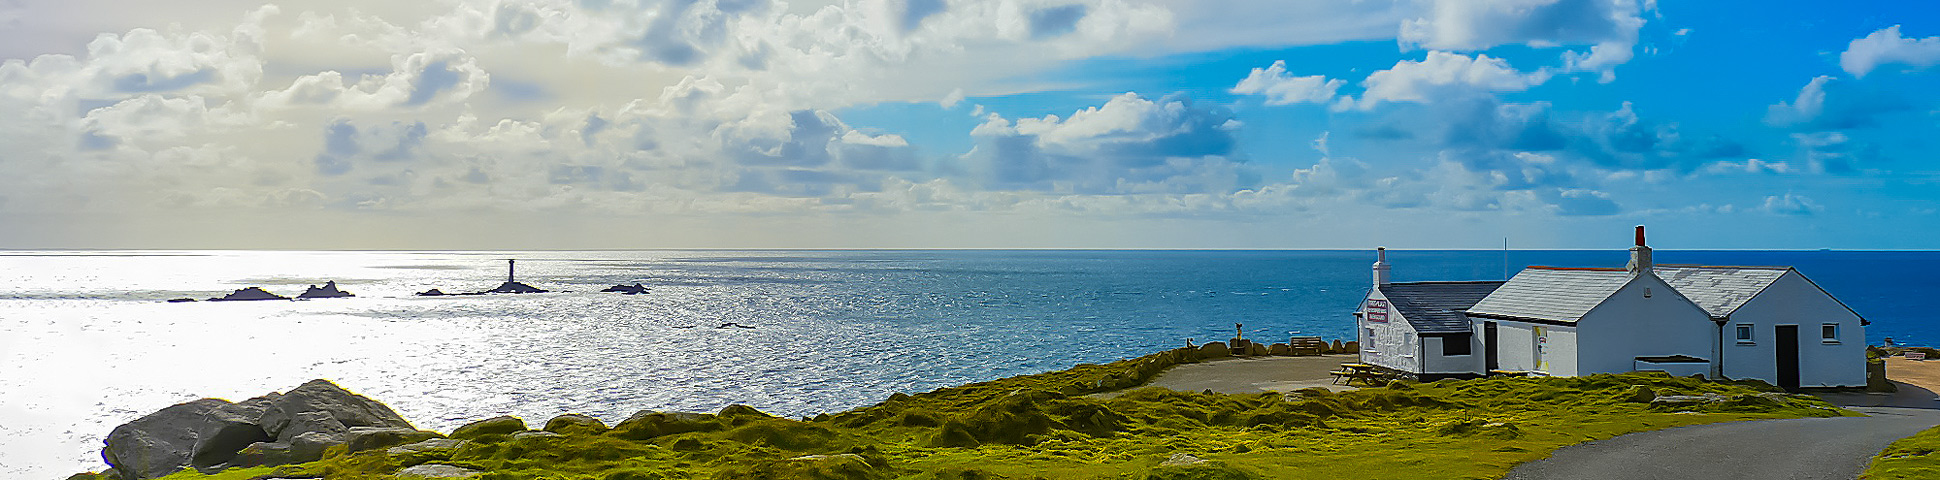 Panoramic view from Lizard Peninsula Self-Guided Walking Tour